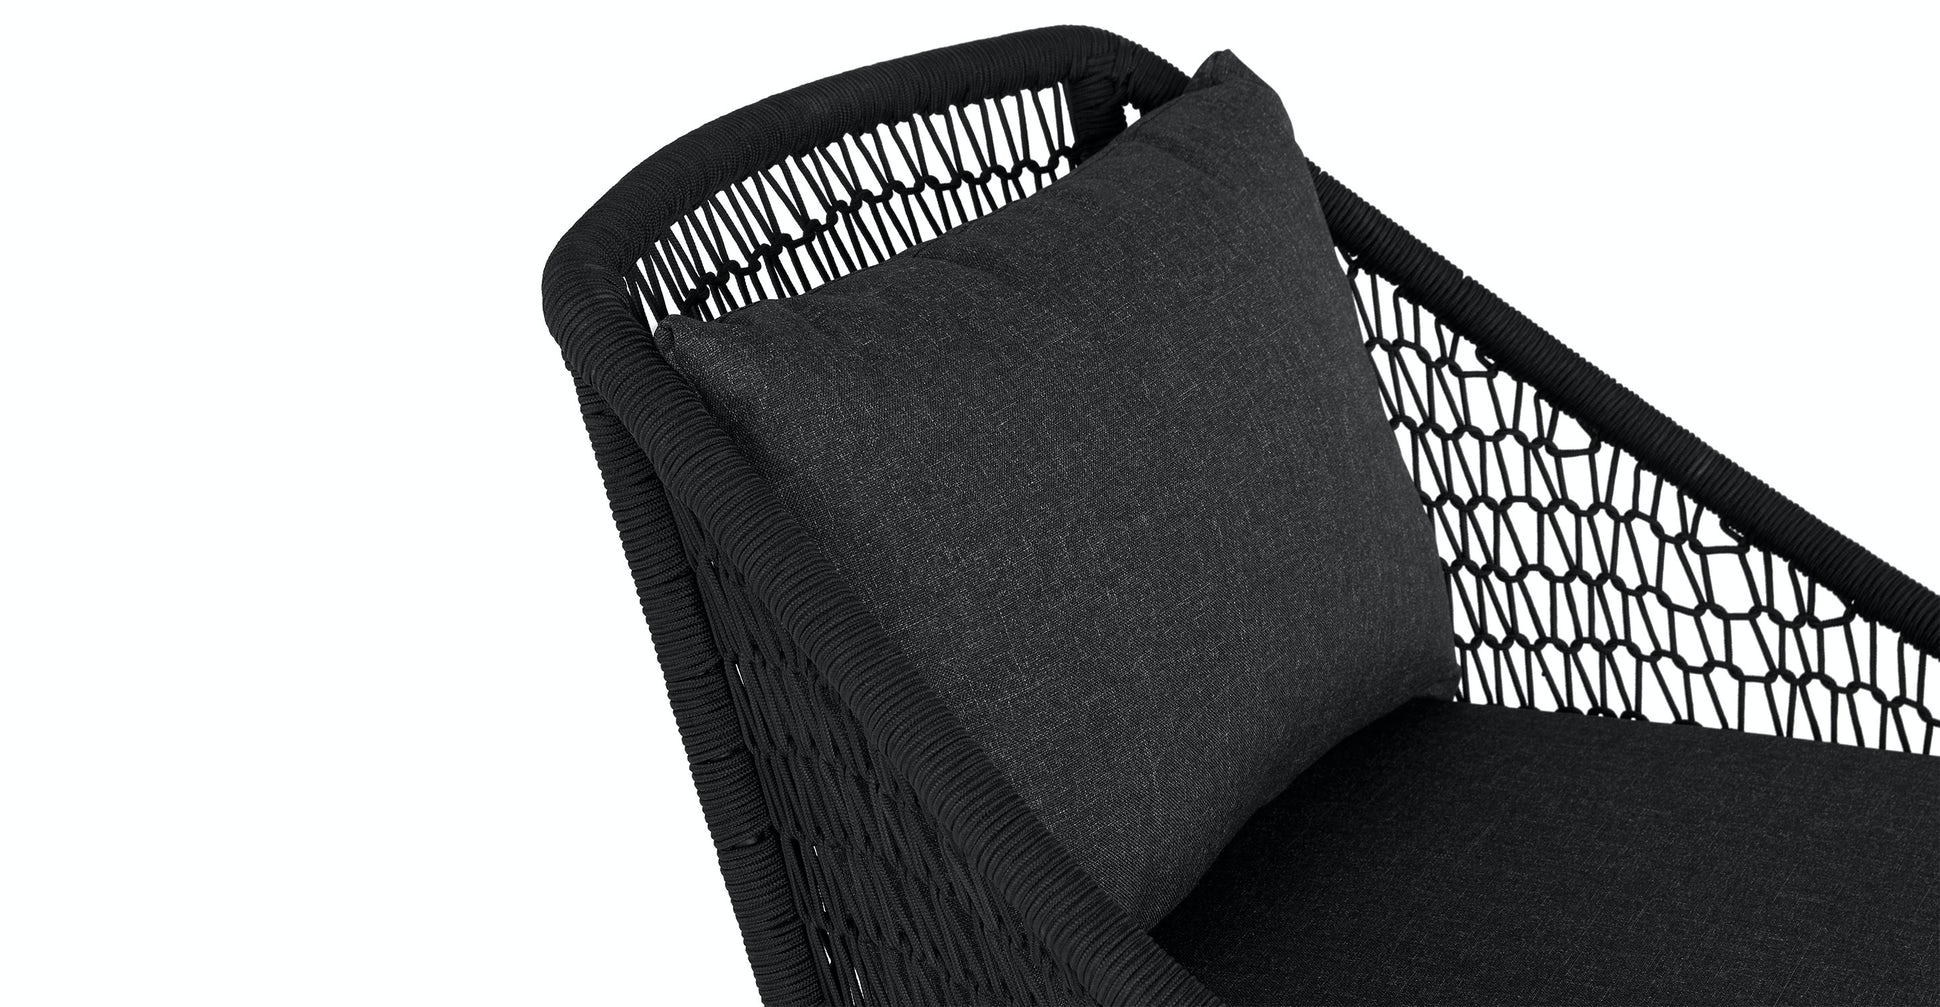 Tupo Slate Gray Lounge Chair